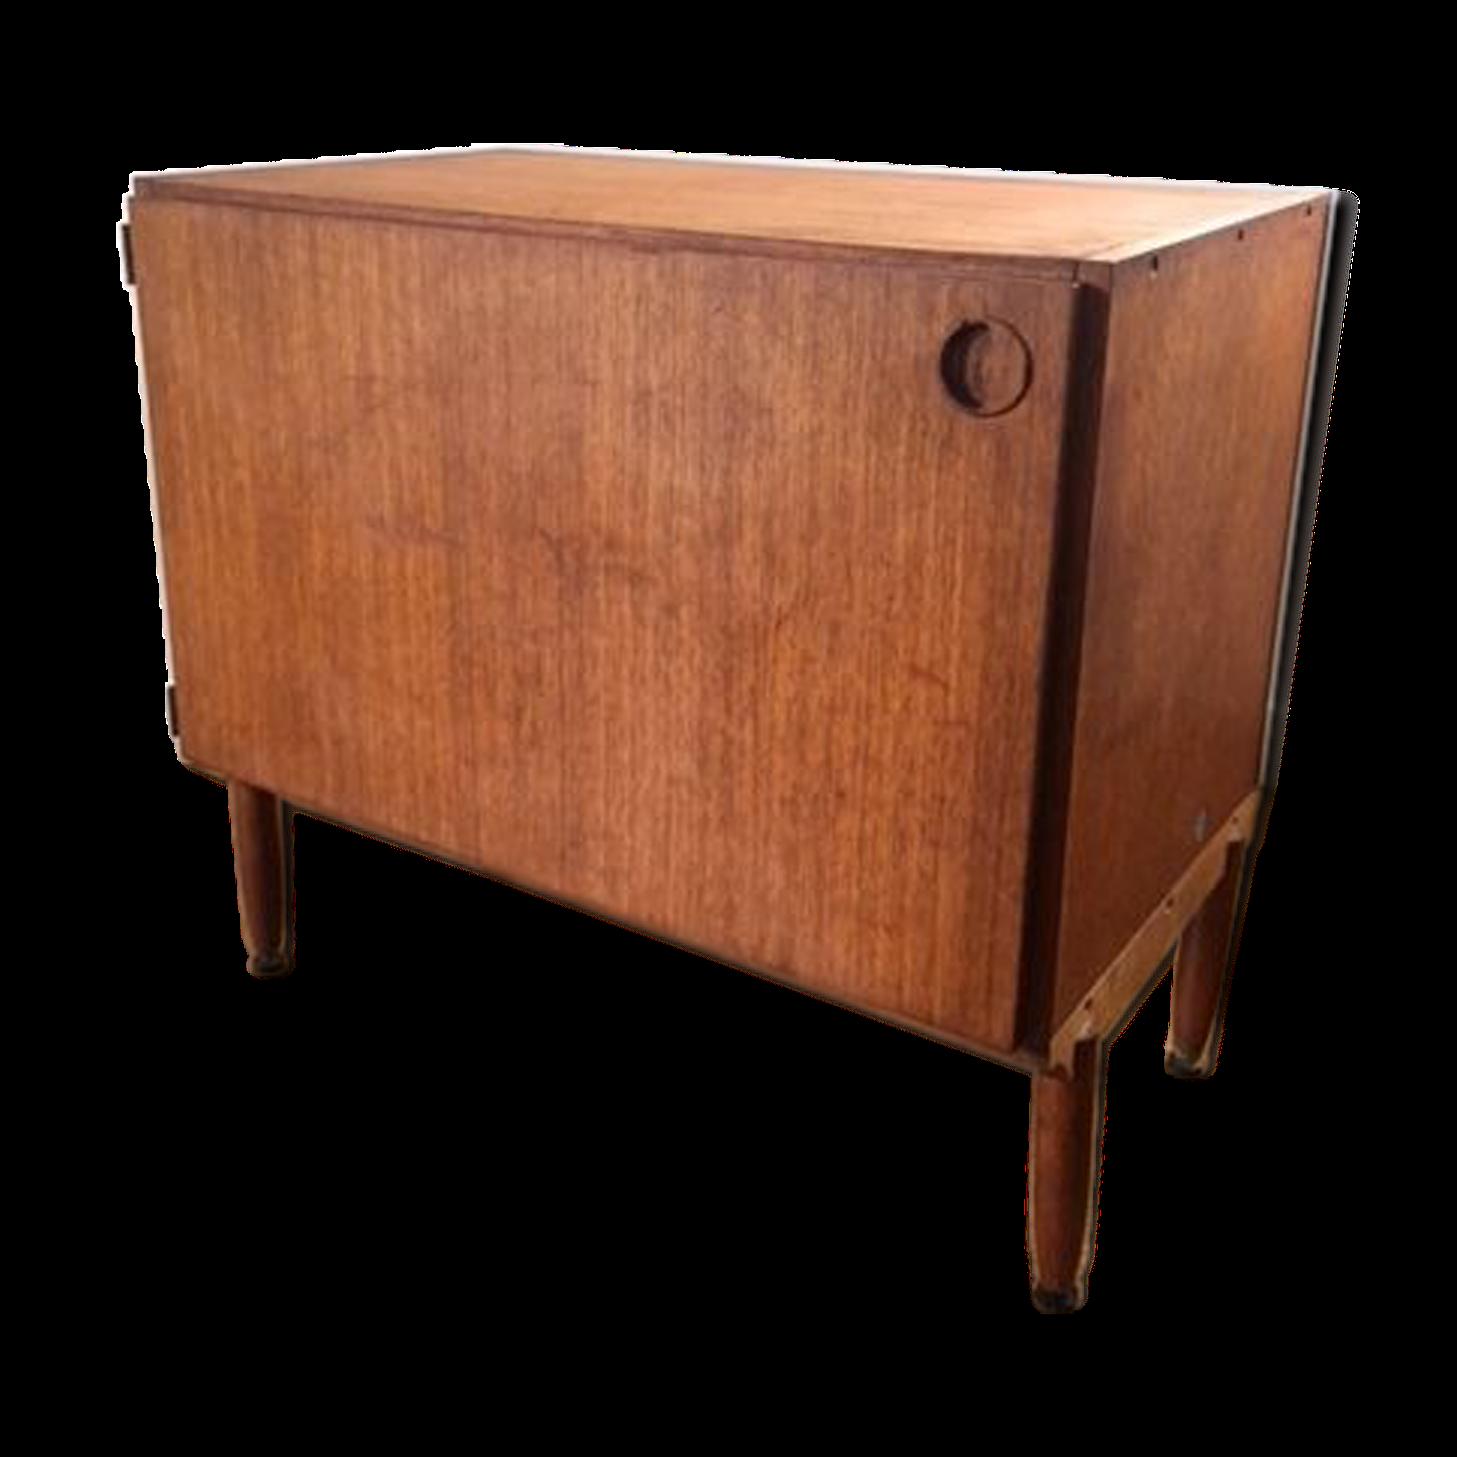 enfilade scandinave pas cher buffet scandinave pas cher decoration mobilier scandinave vintage. Black Bedroom Furniture Sets. Home Design Ideas